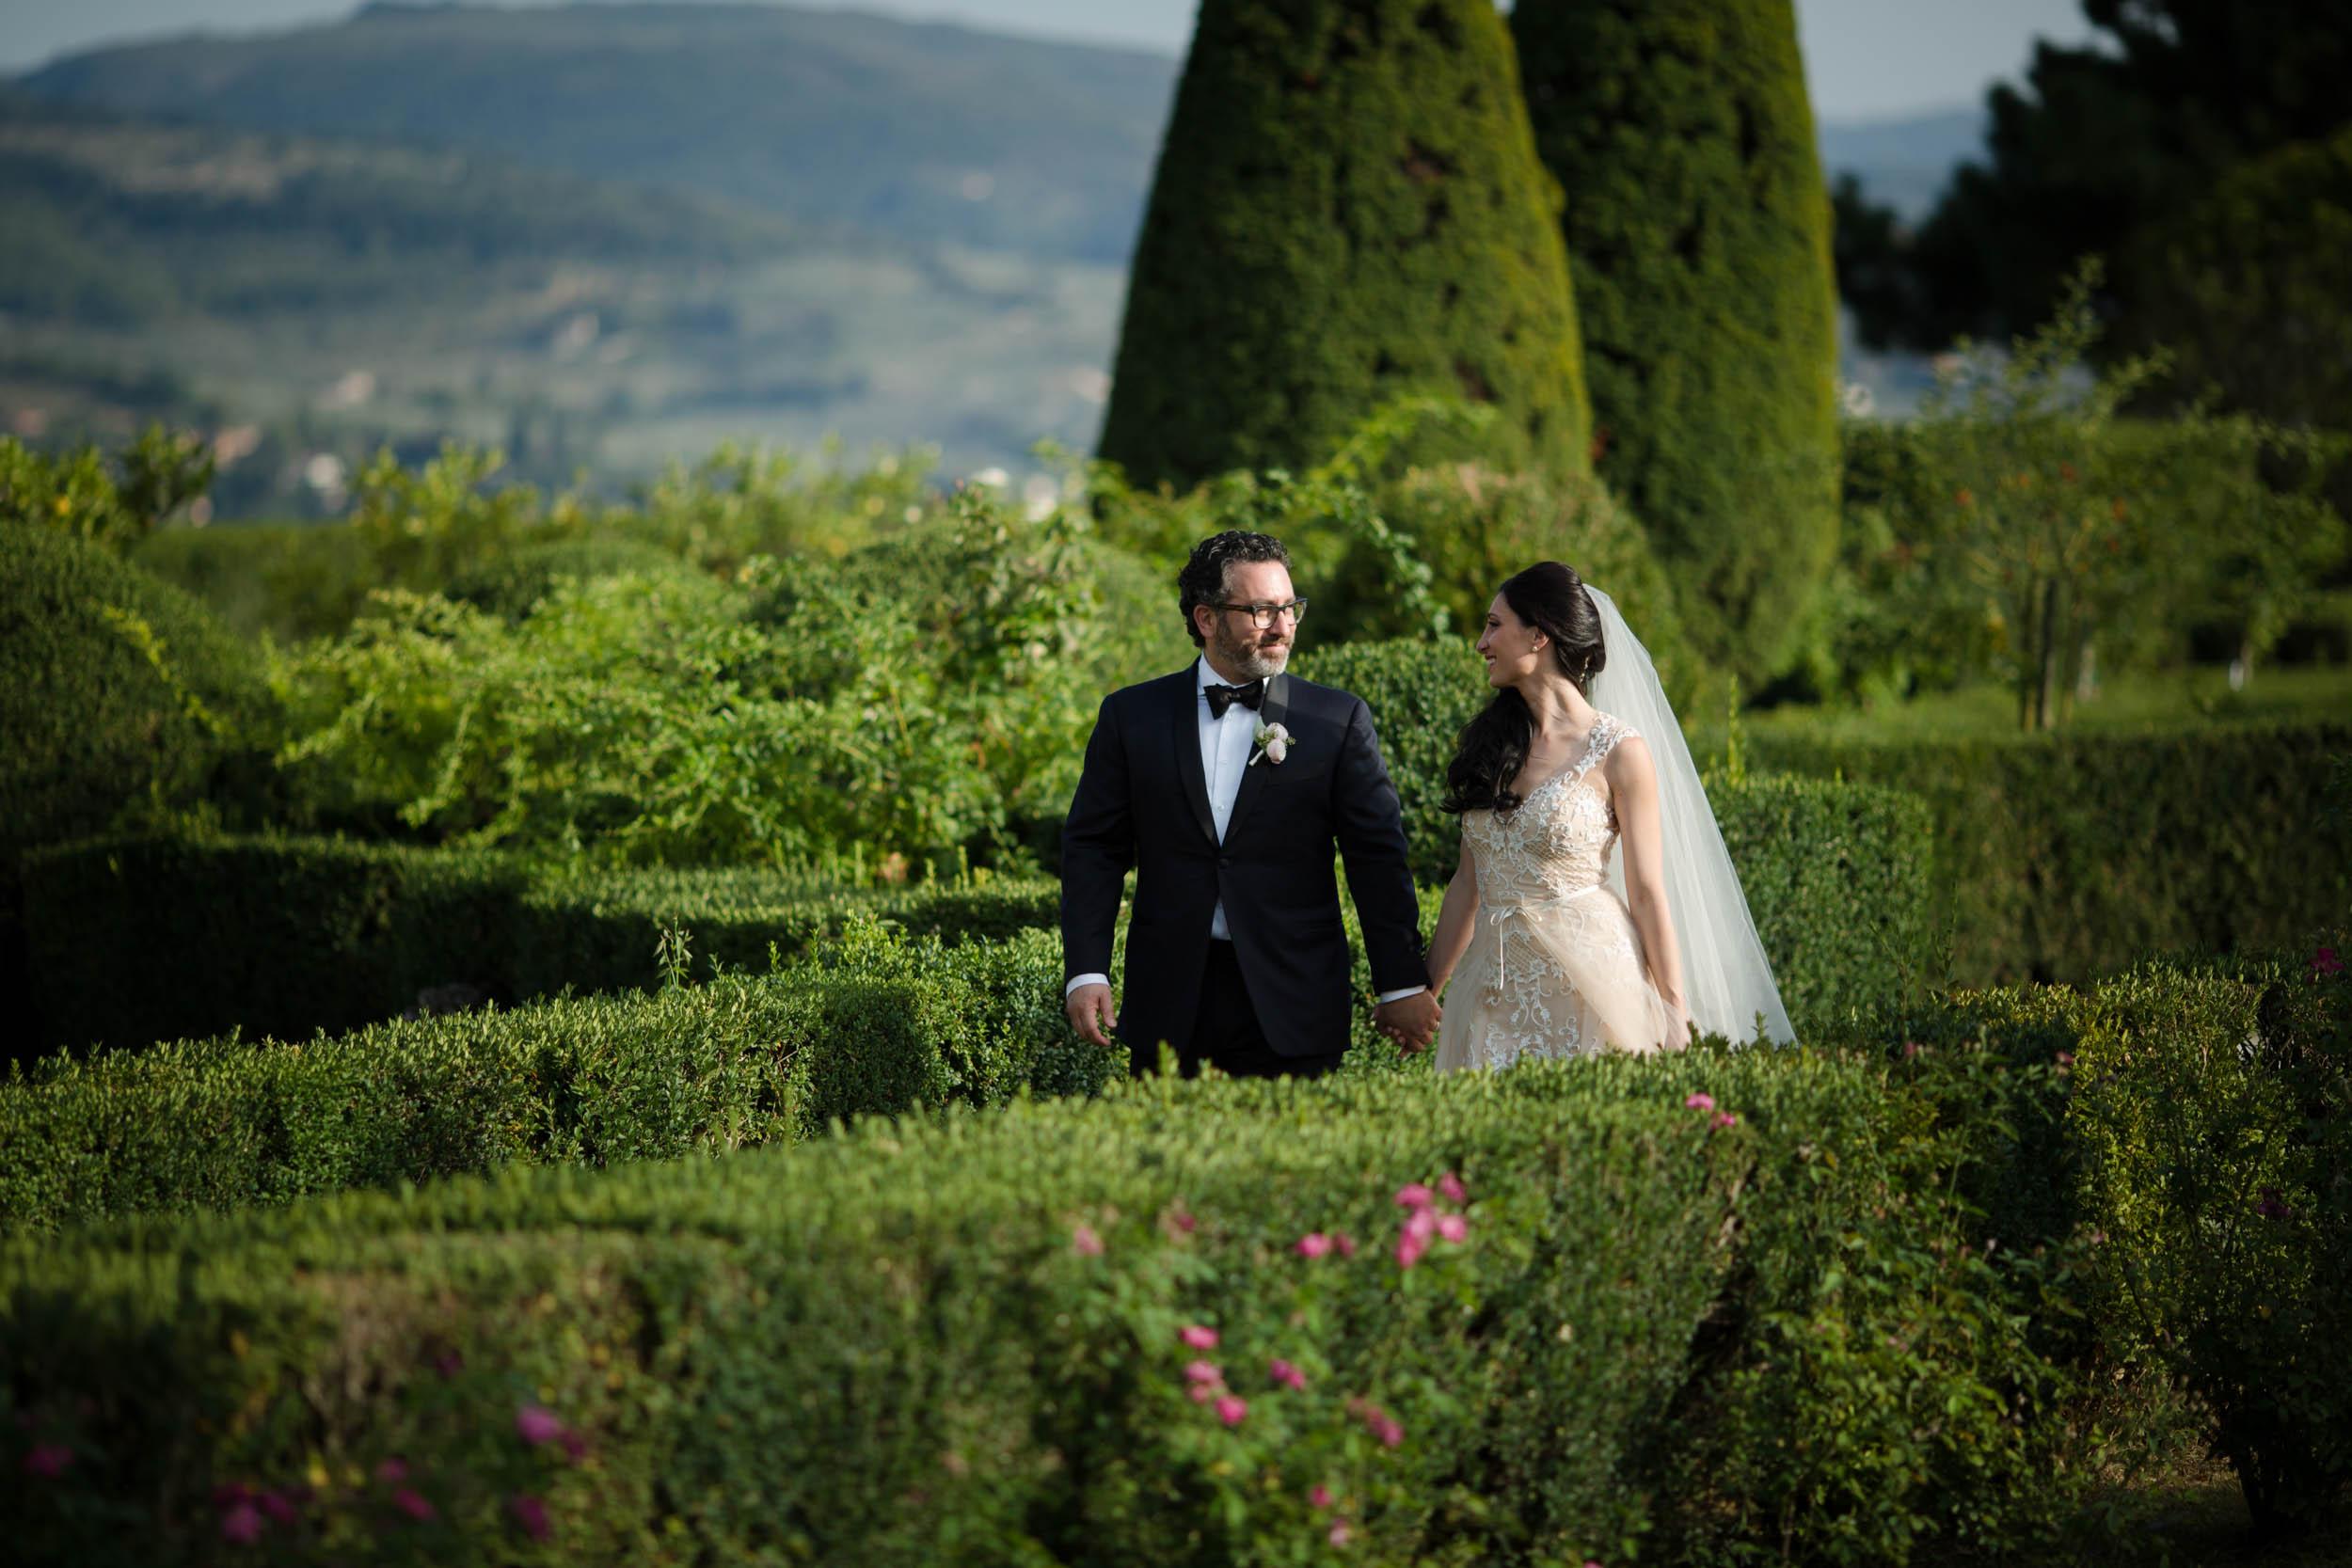 villa-gamberaia-florence-italy-destination-wedding-53.jpg